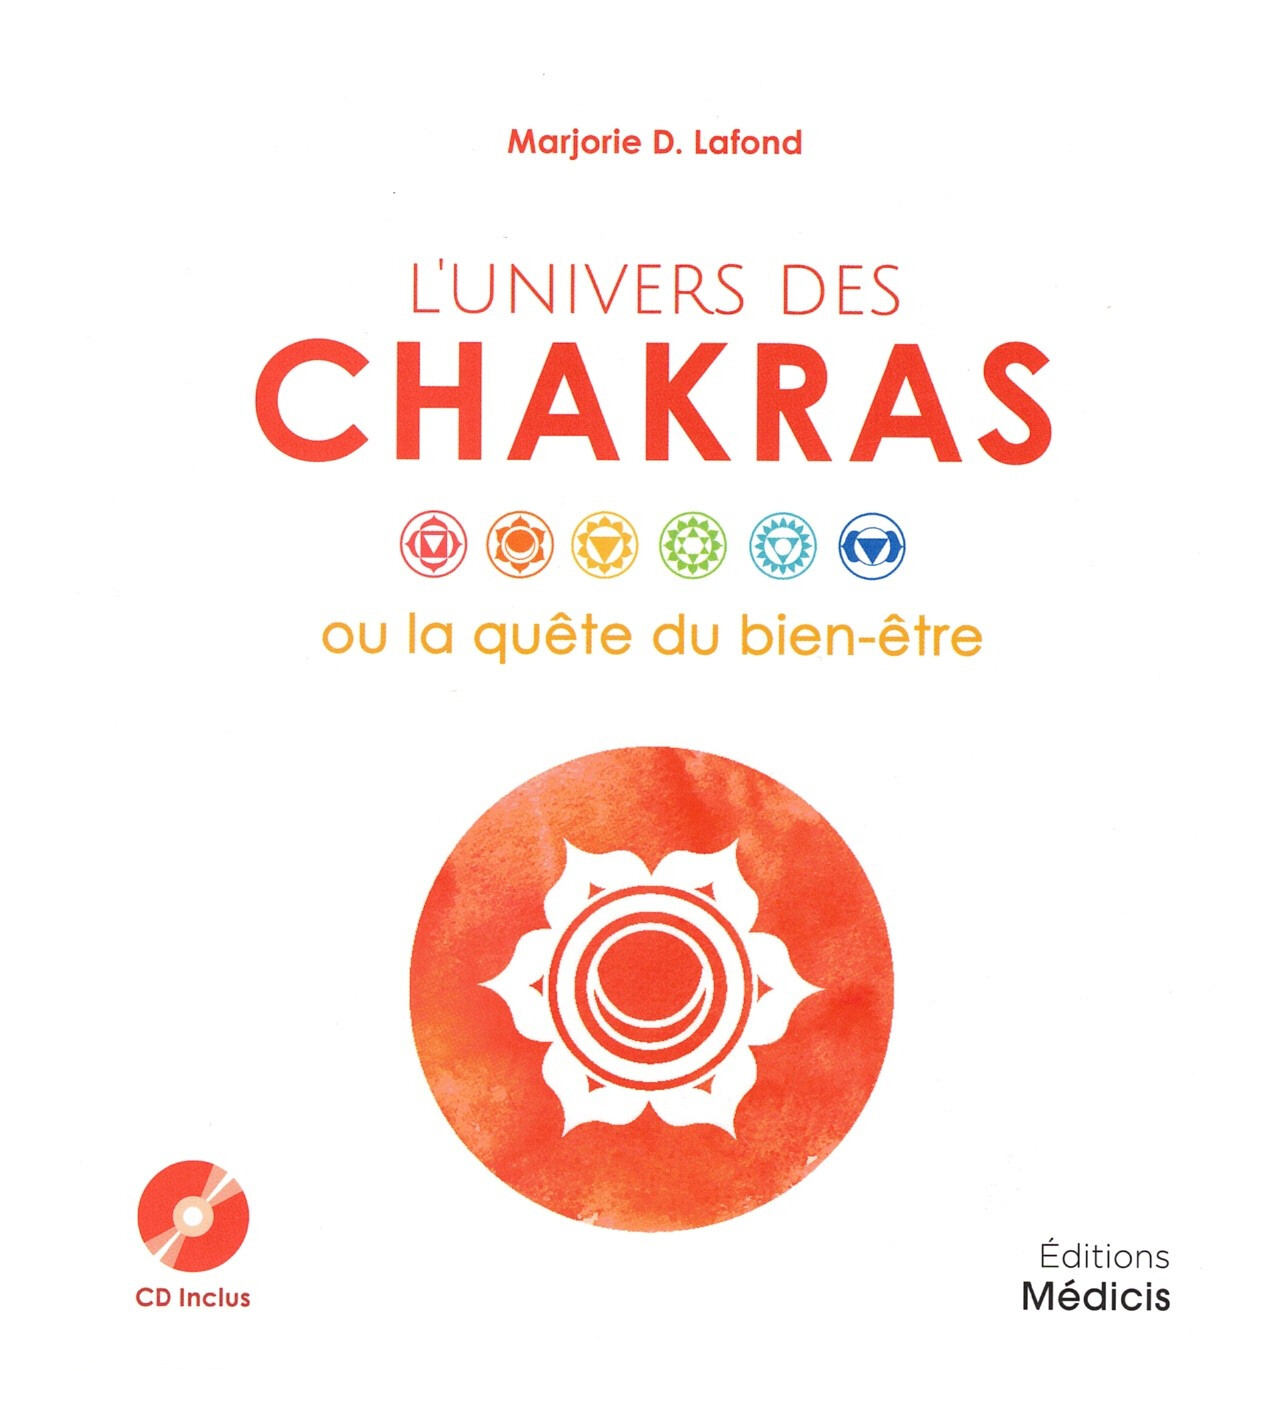 L'univers des Chakras